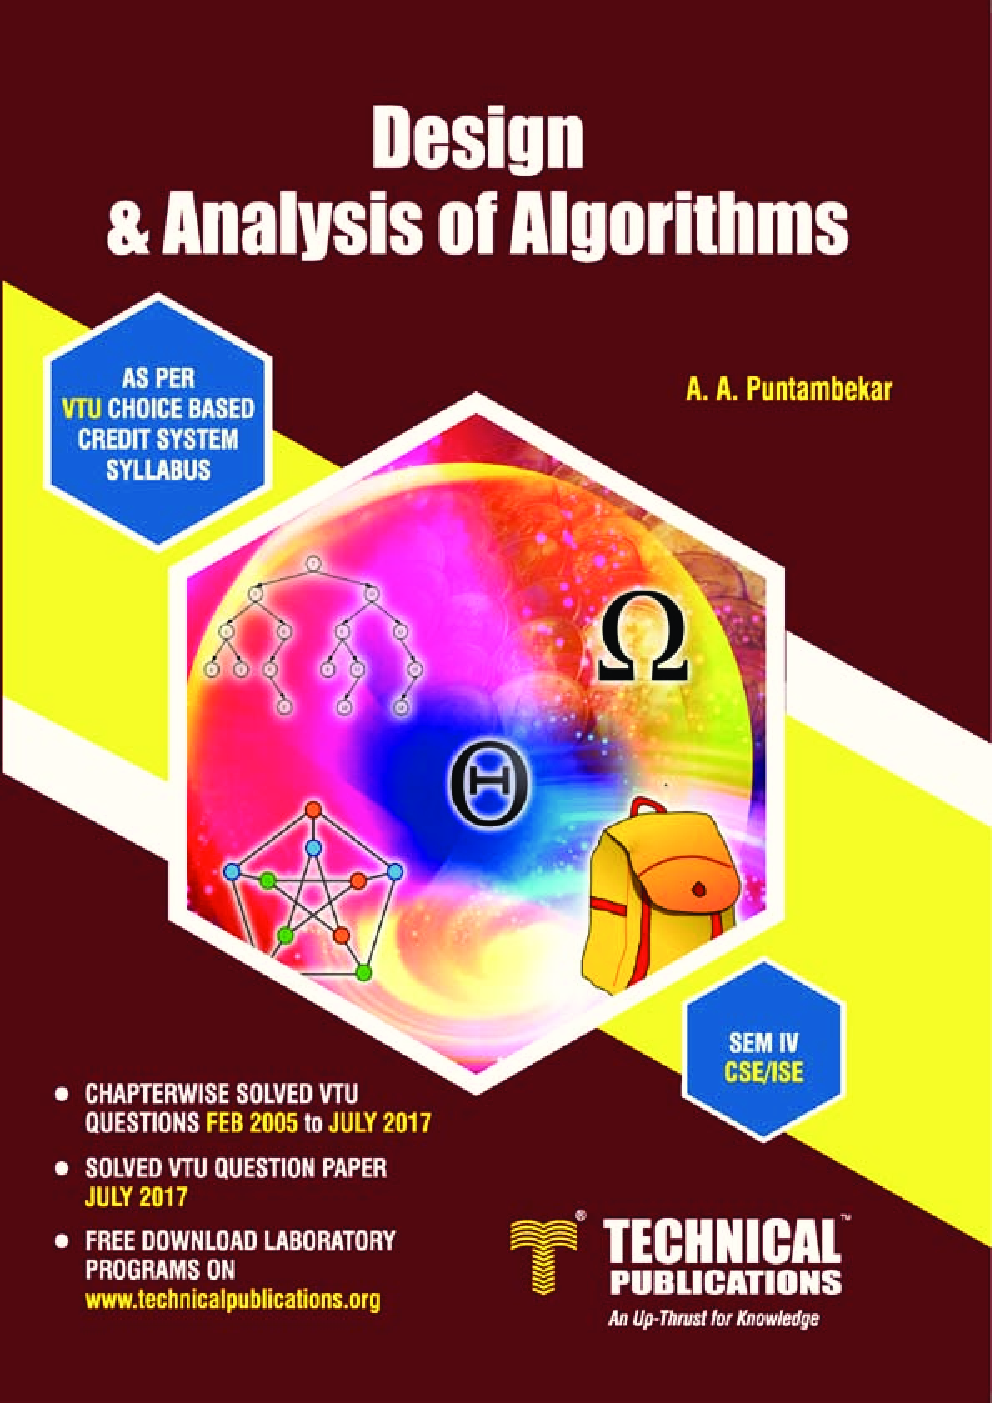 Design And Analysis Of Algorithms For VTU Course 17 CBCS (IV- CSE - 17CS43) - Page 1